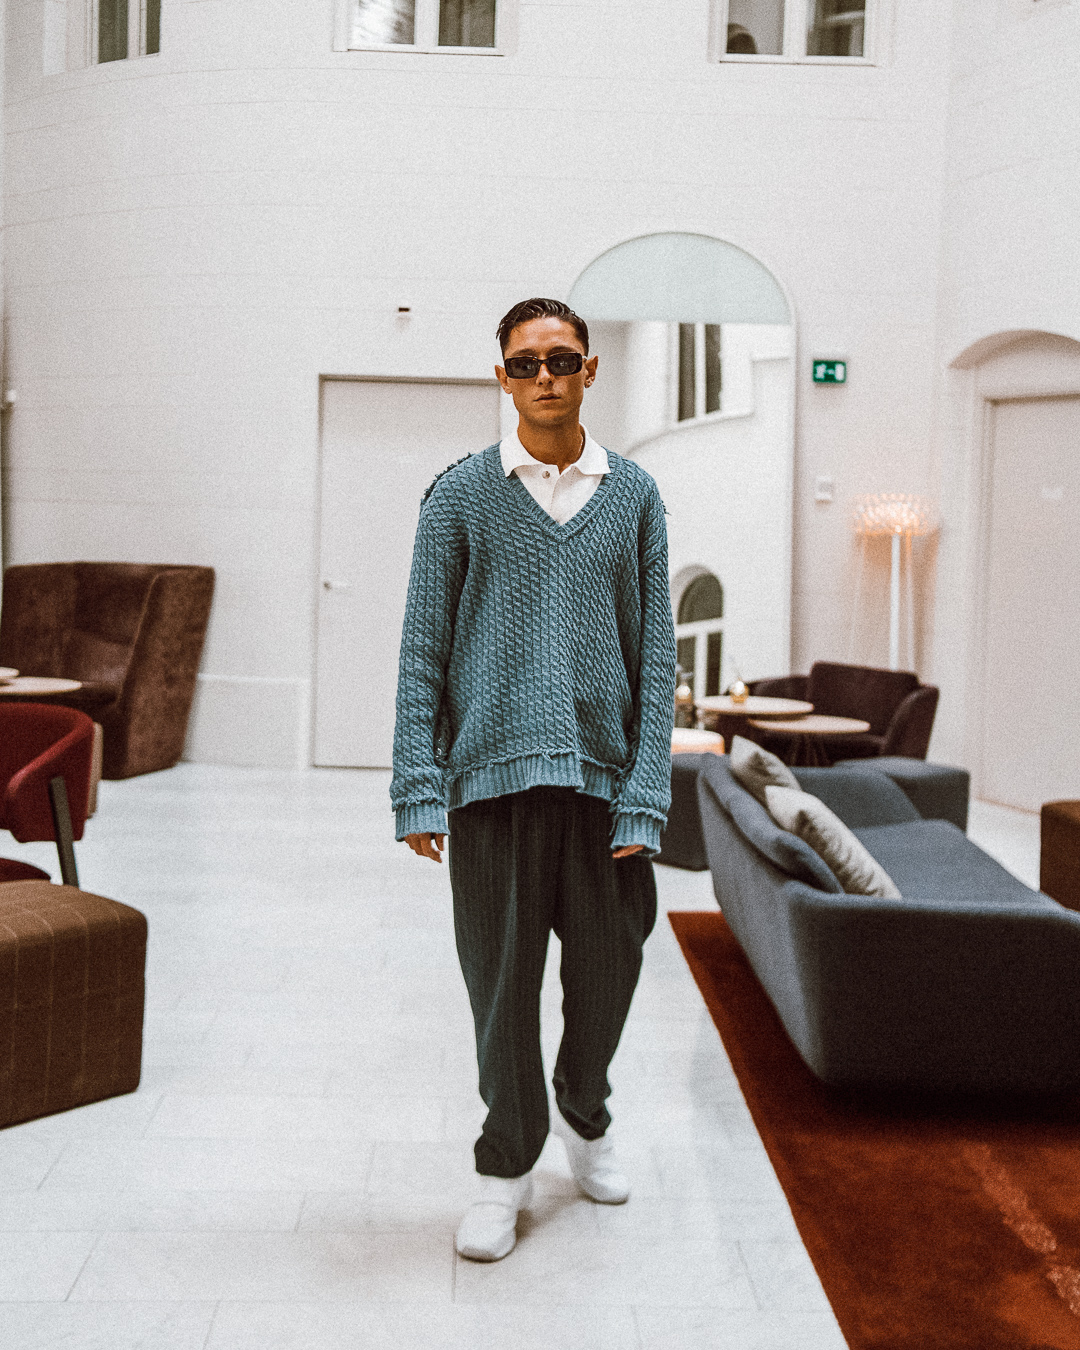 ◎ Wearing a vintage Dolce & Gabbana sweater